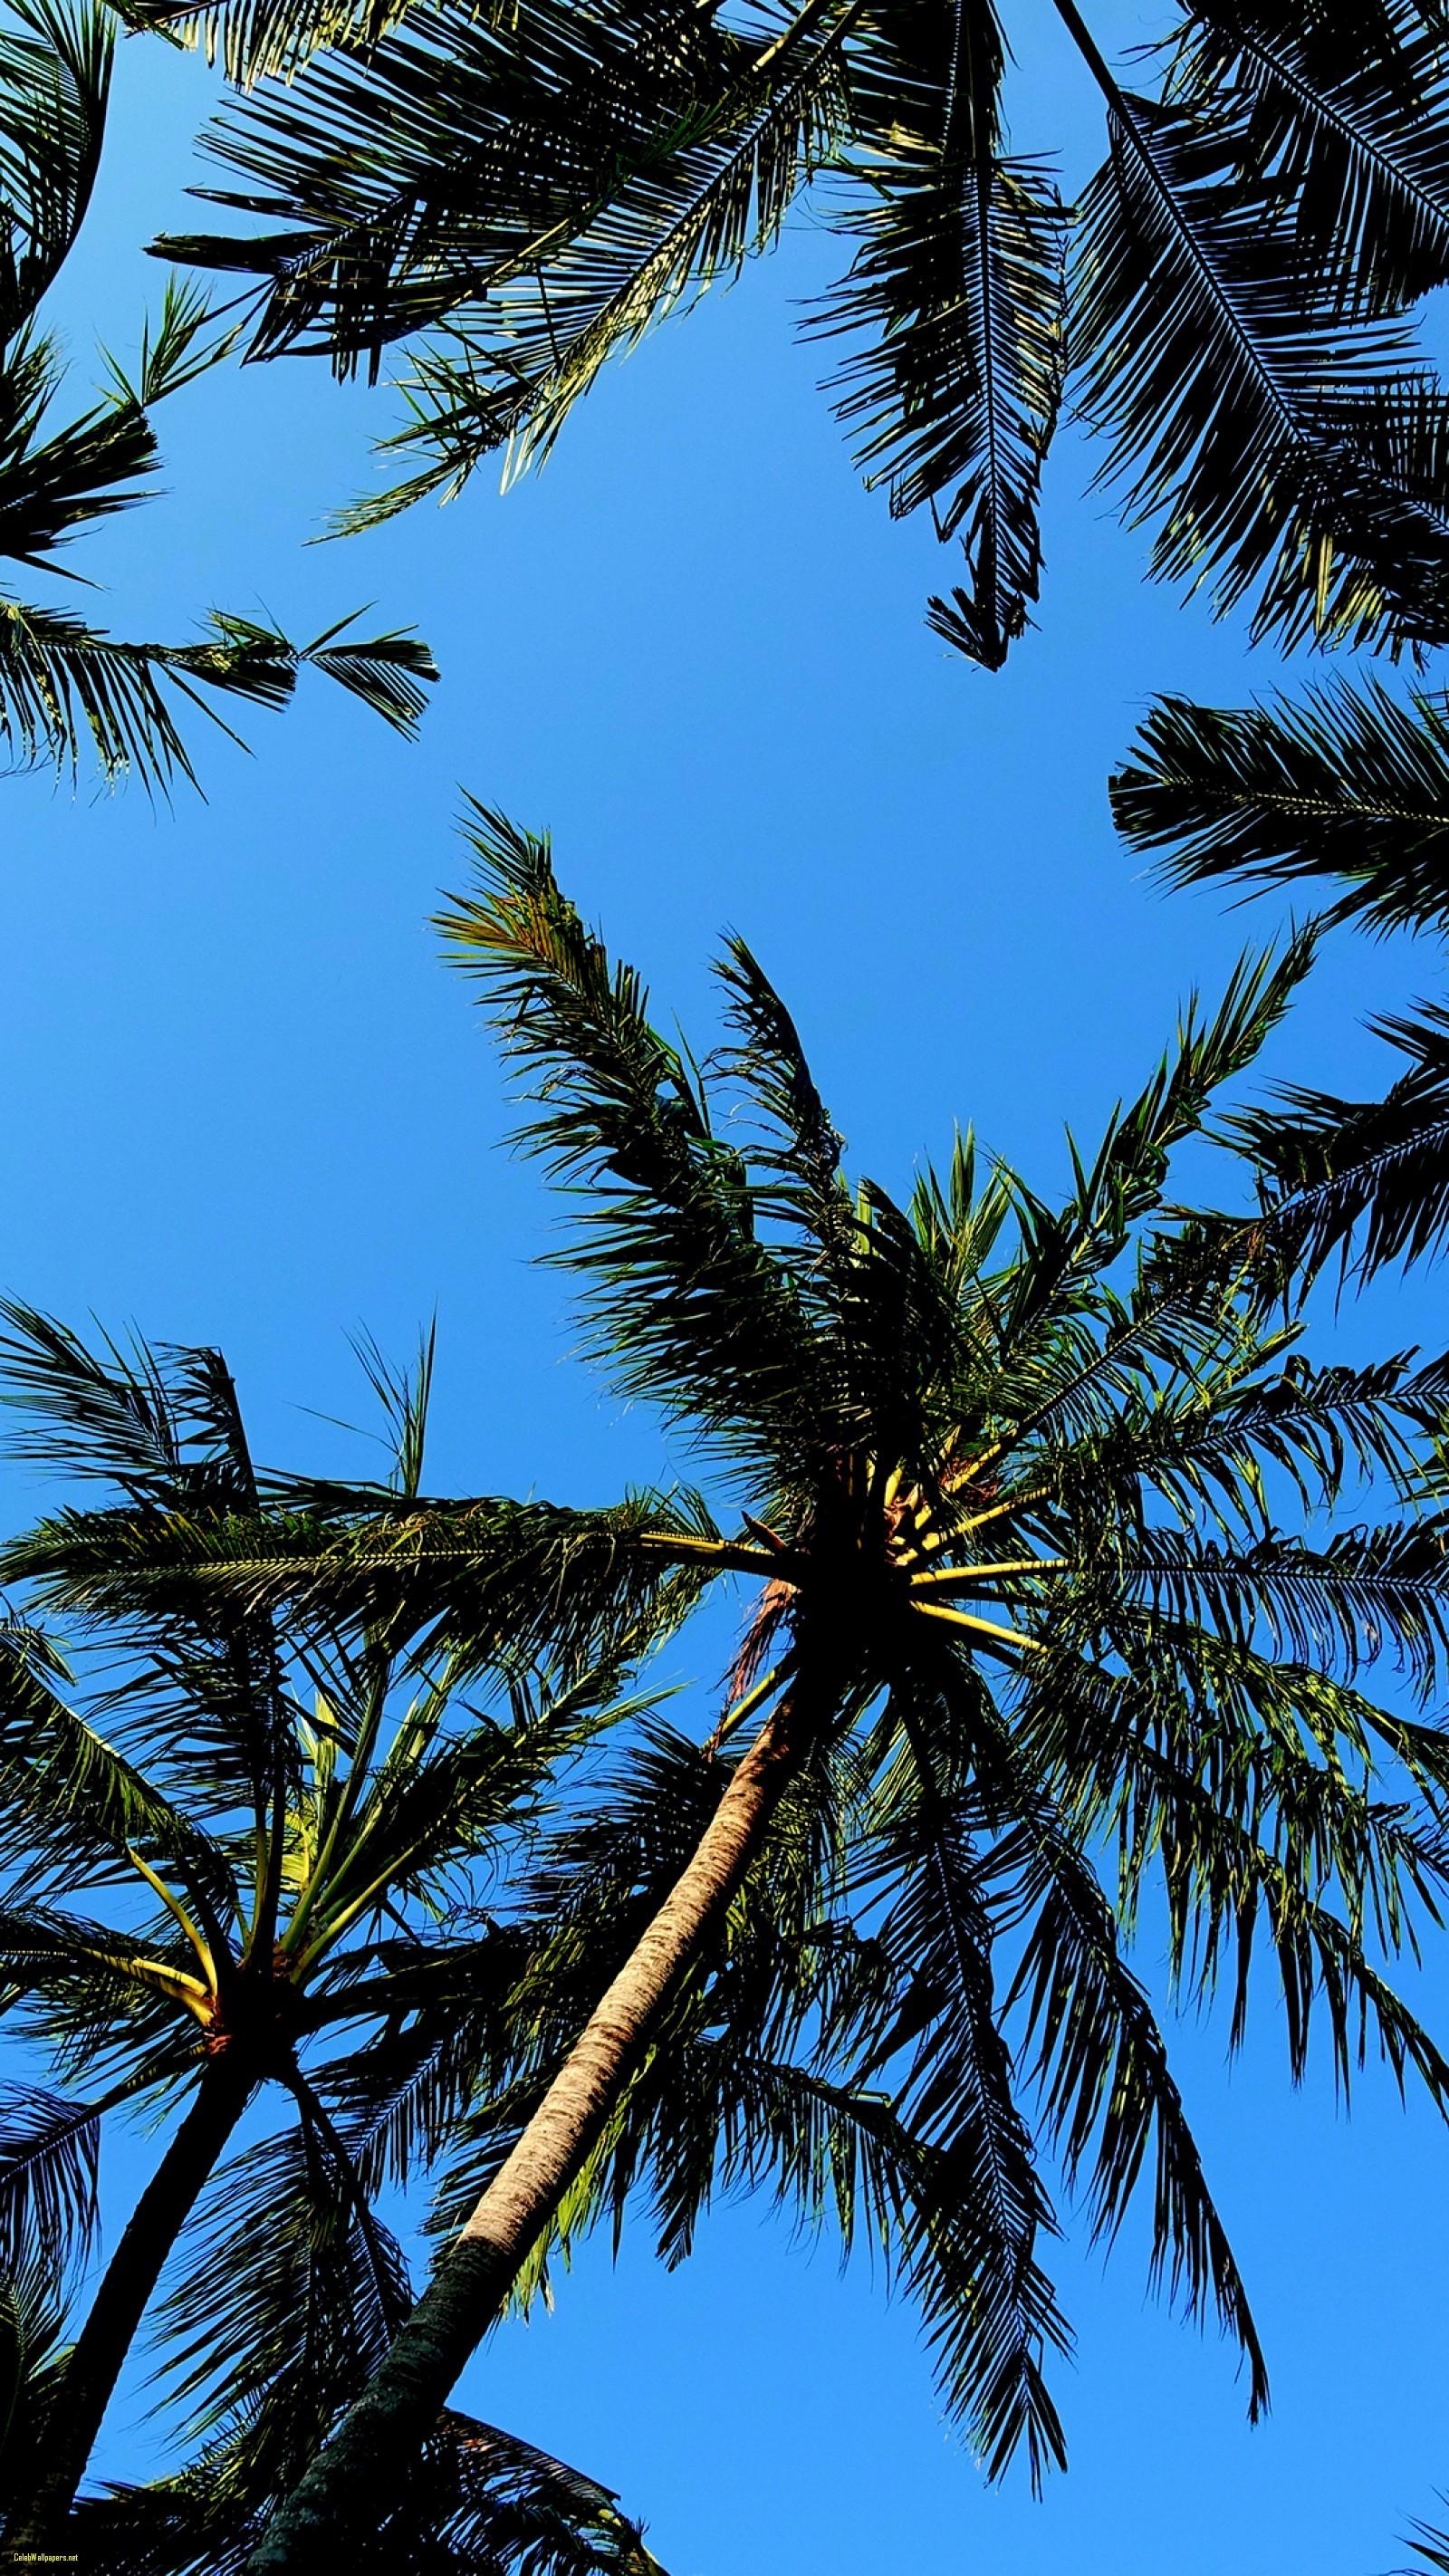 1600x2844, Palm Trees Cool Samsung Galaxy S7 Wallpaper - Palm Tree Wallpaper Hd - HD Wallpaper